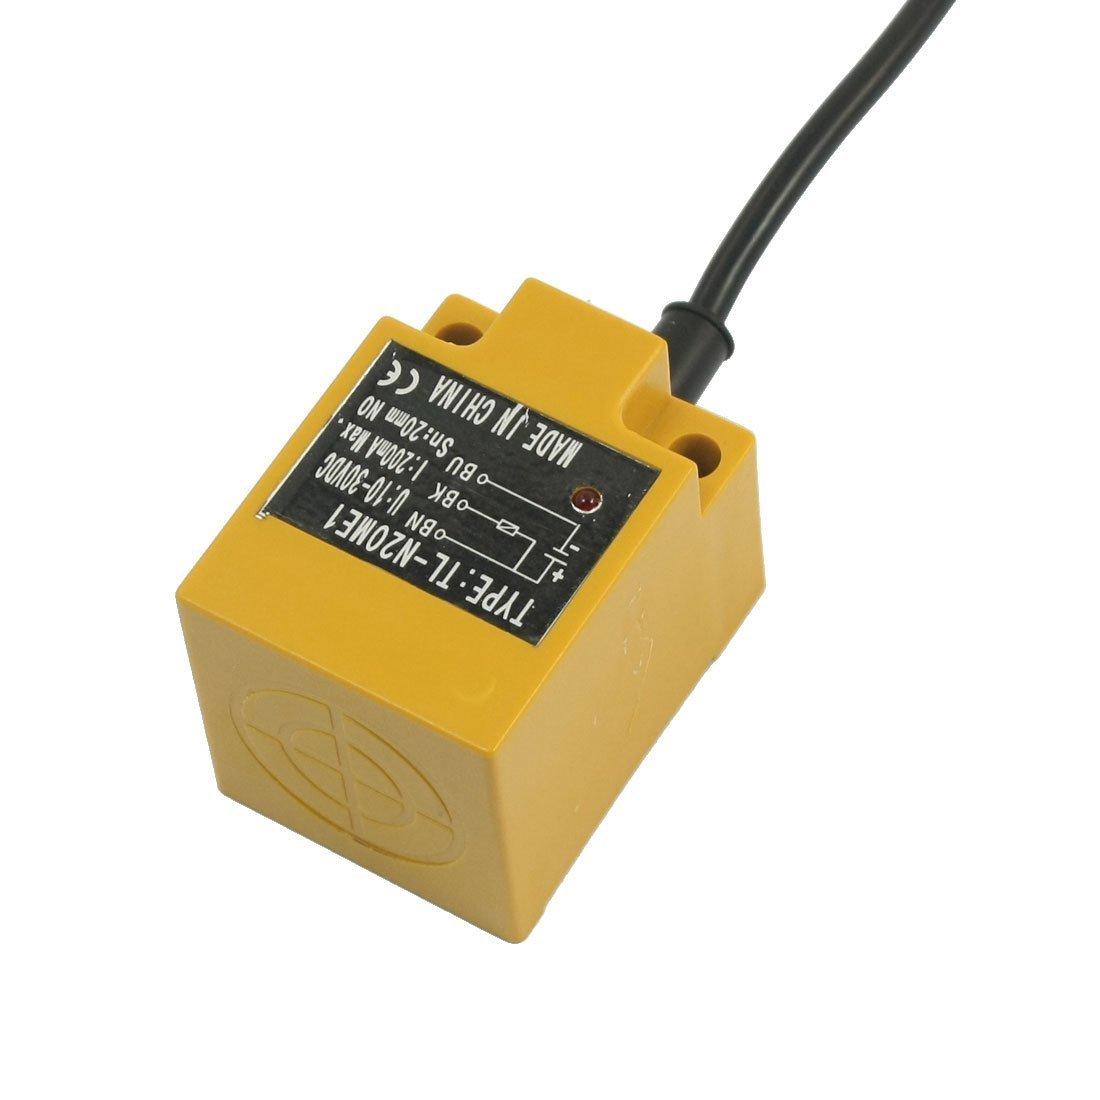 TL-N20ME1 NO 20mm Entfernung Induktive Näherungssensor Schalter DC 10-30V